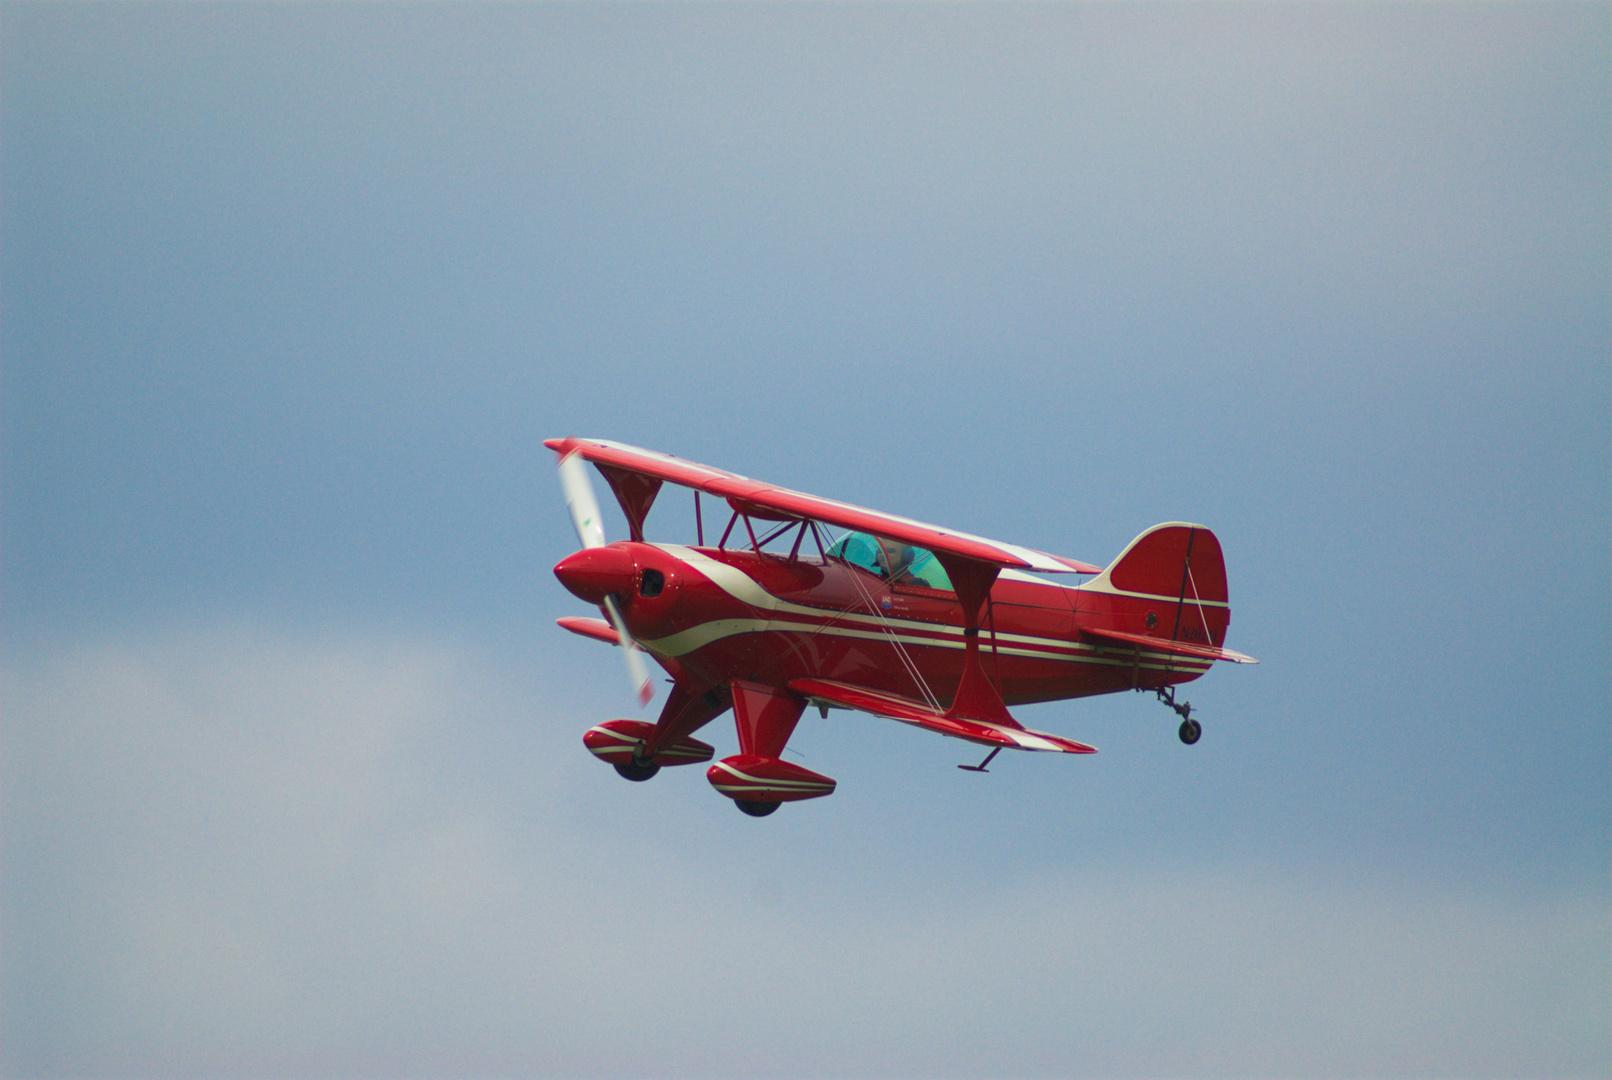 Airshow 2013 Krefeld: Kunstflieger Pitt S1